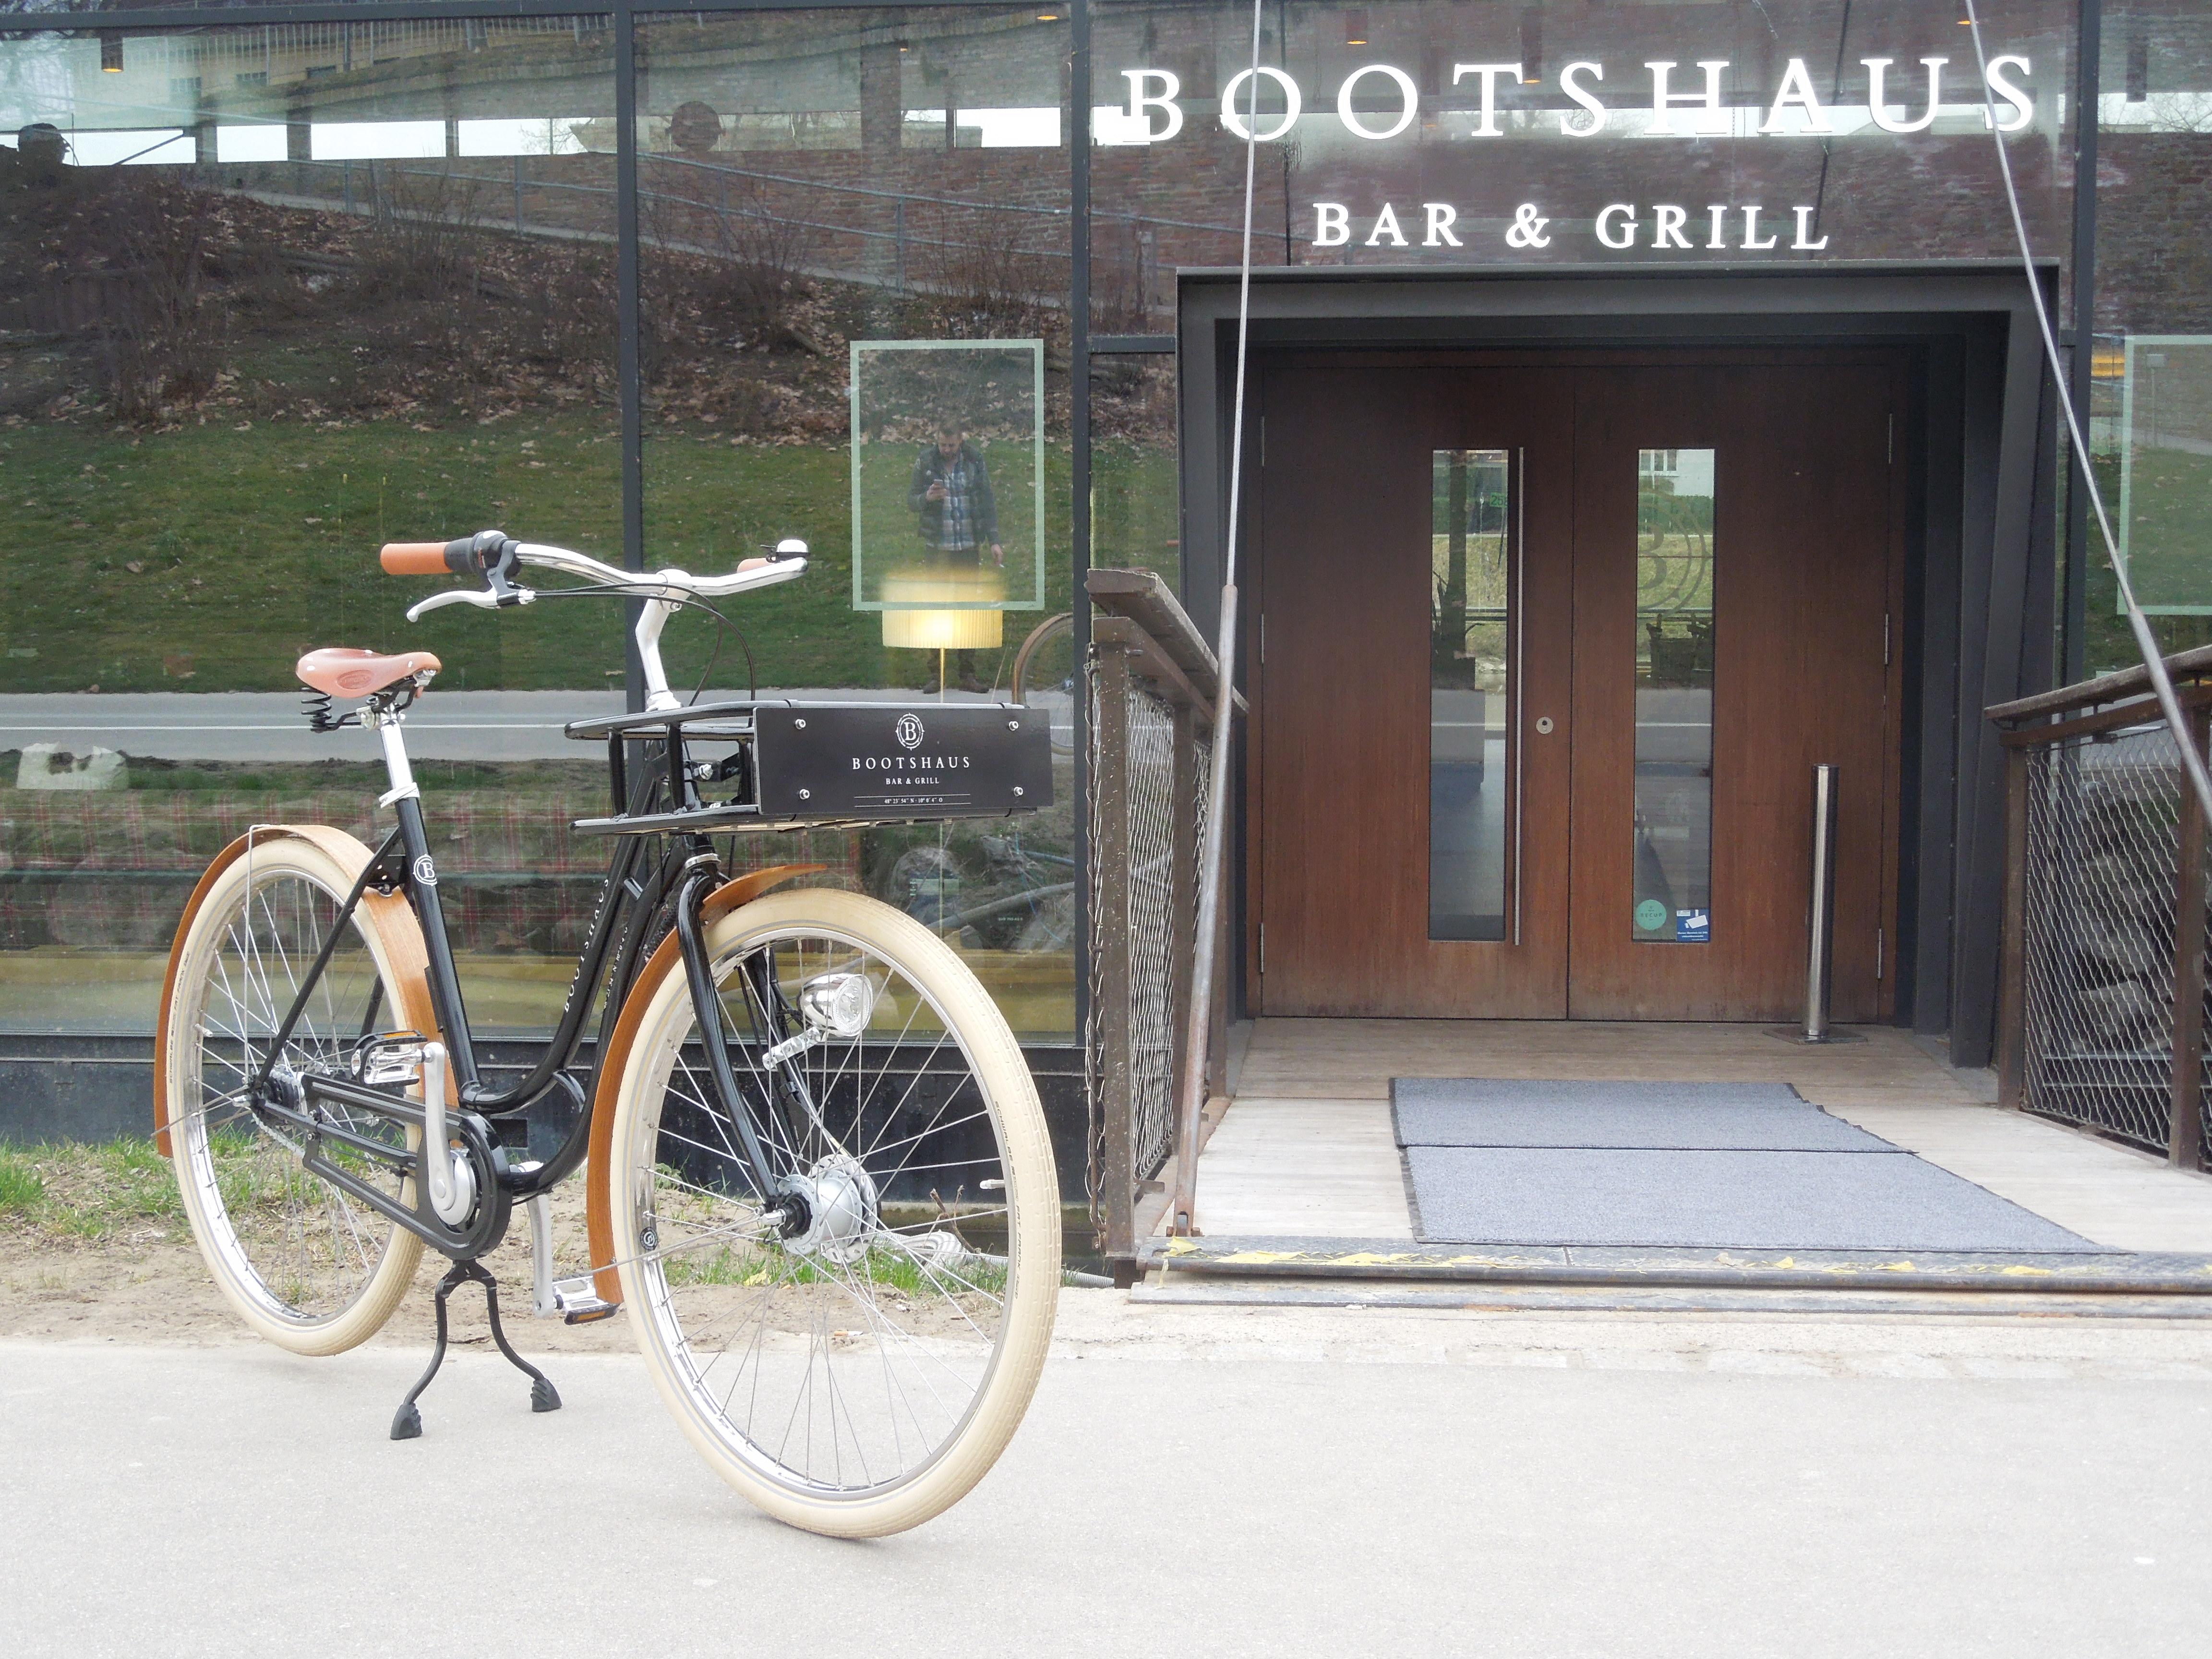 PEDALEUR - Bootshaus Bar & Grill